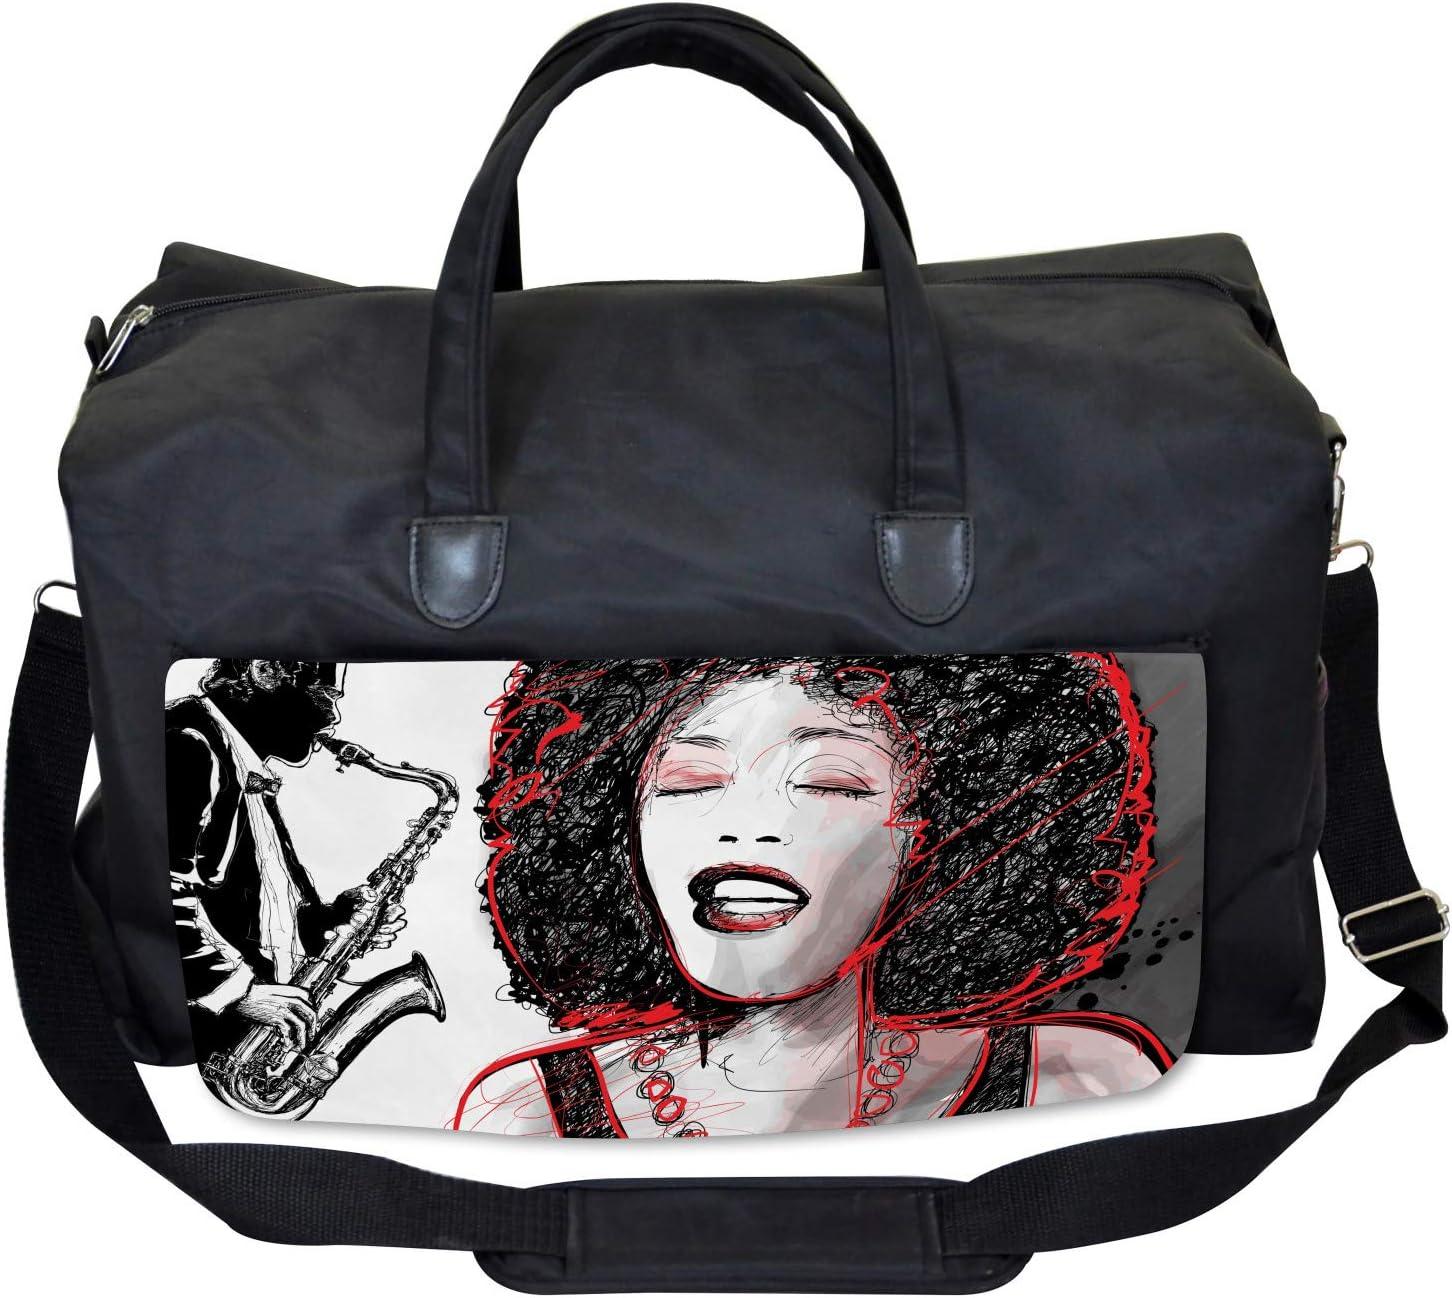 Ambesonne Music Gym Bag Afro American Girl Sings Large Weekender Carry-on